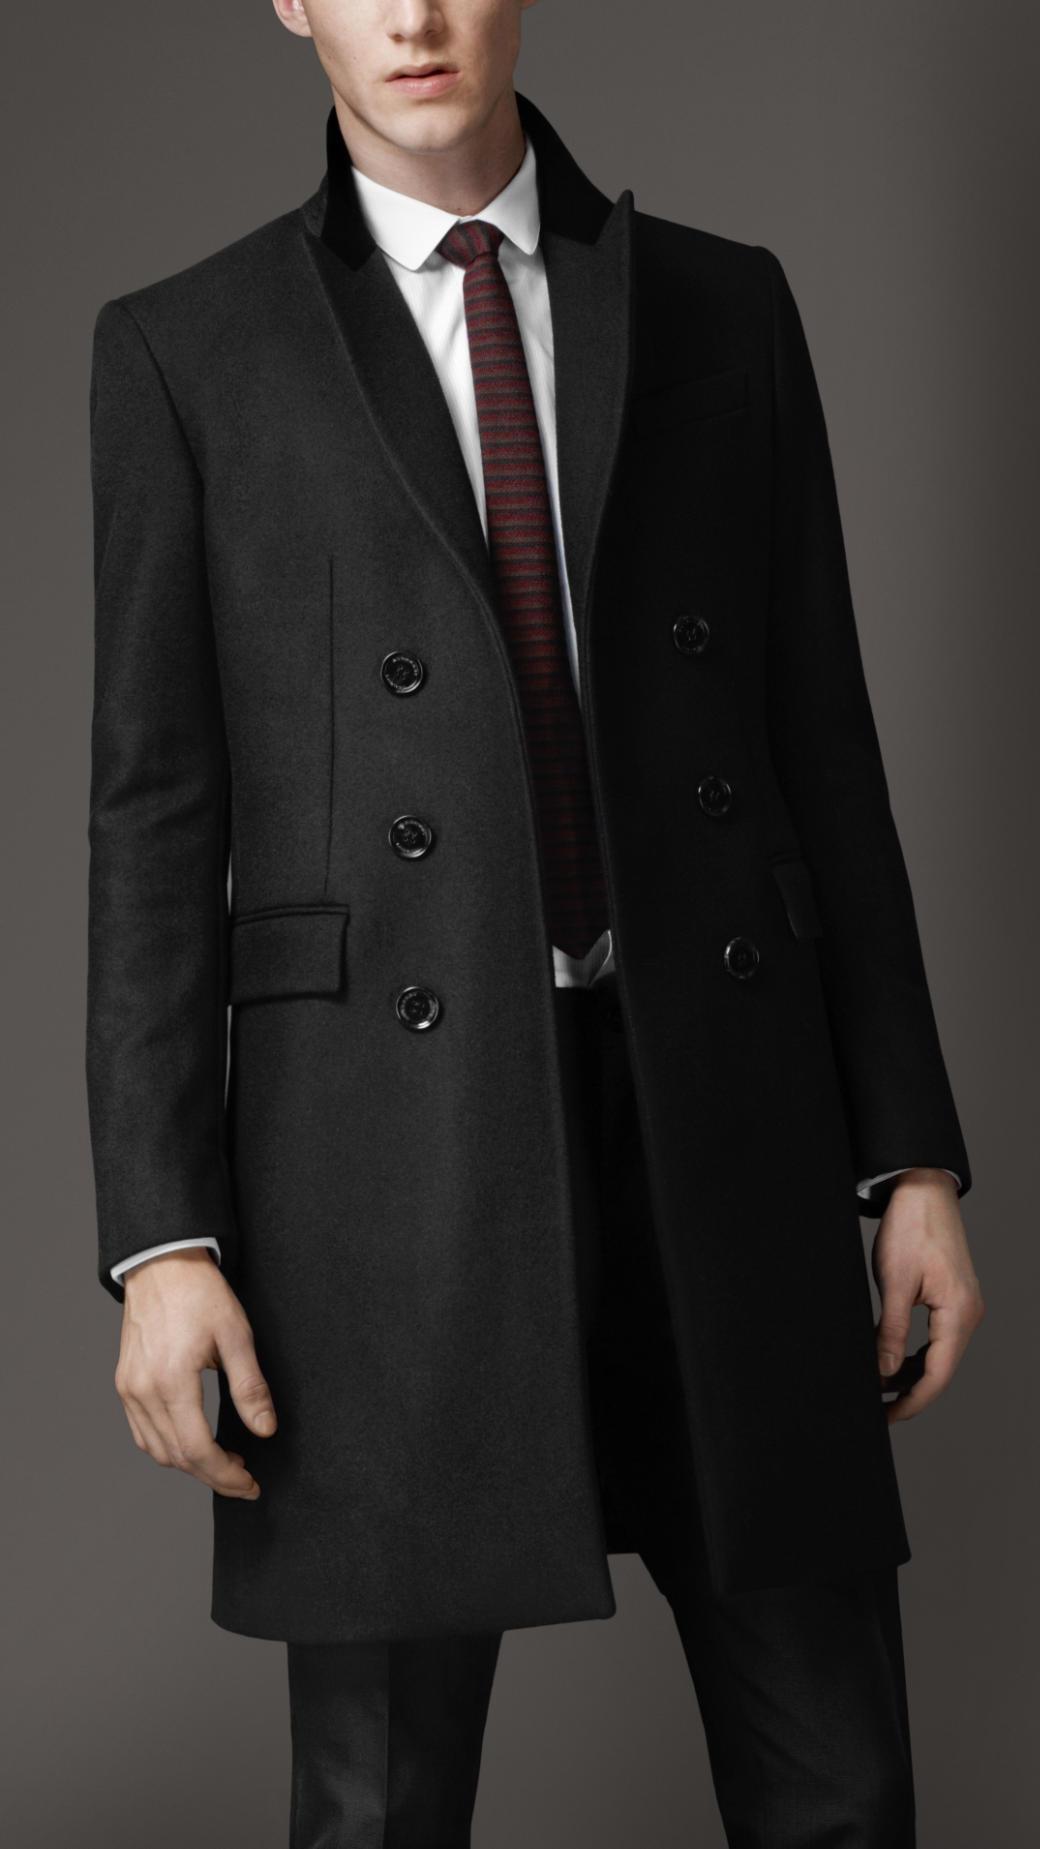 Burberry Velvet Collar Top Coat In Black For Men